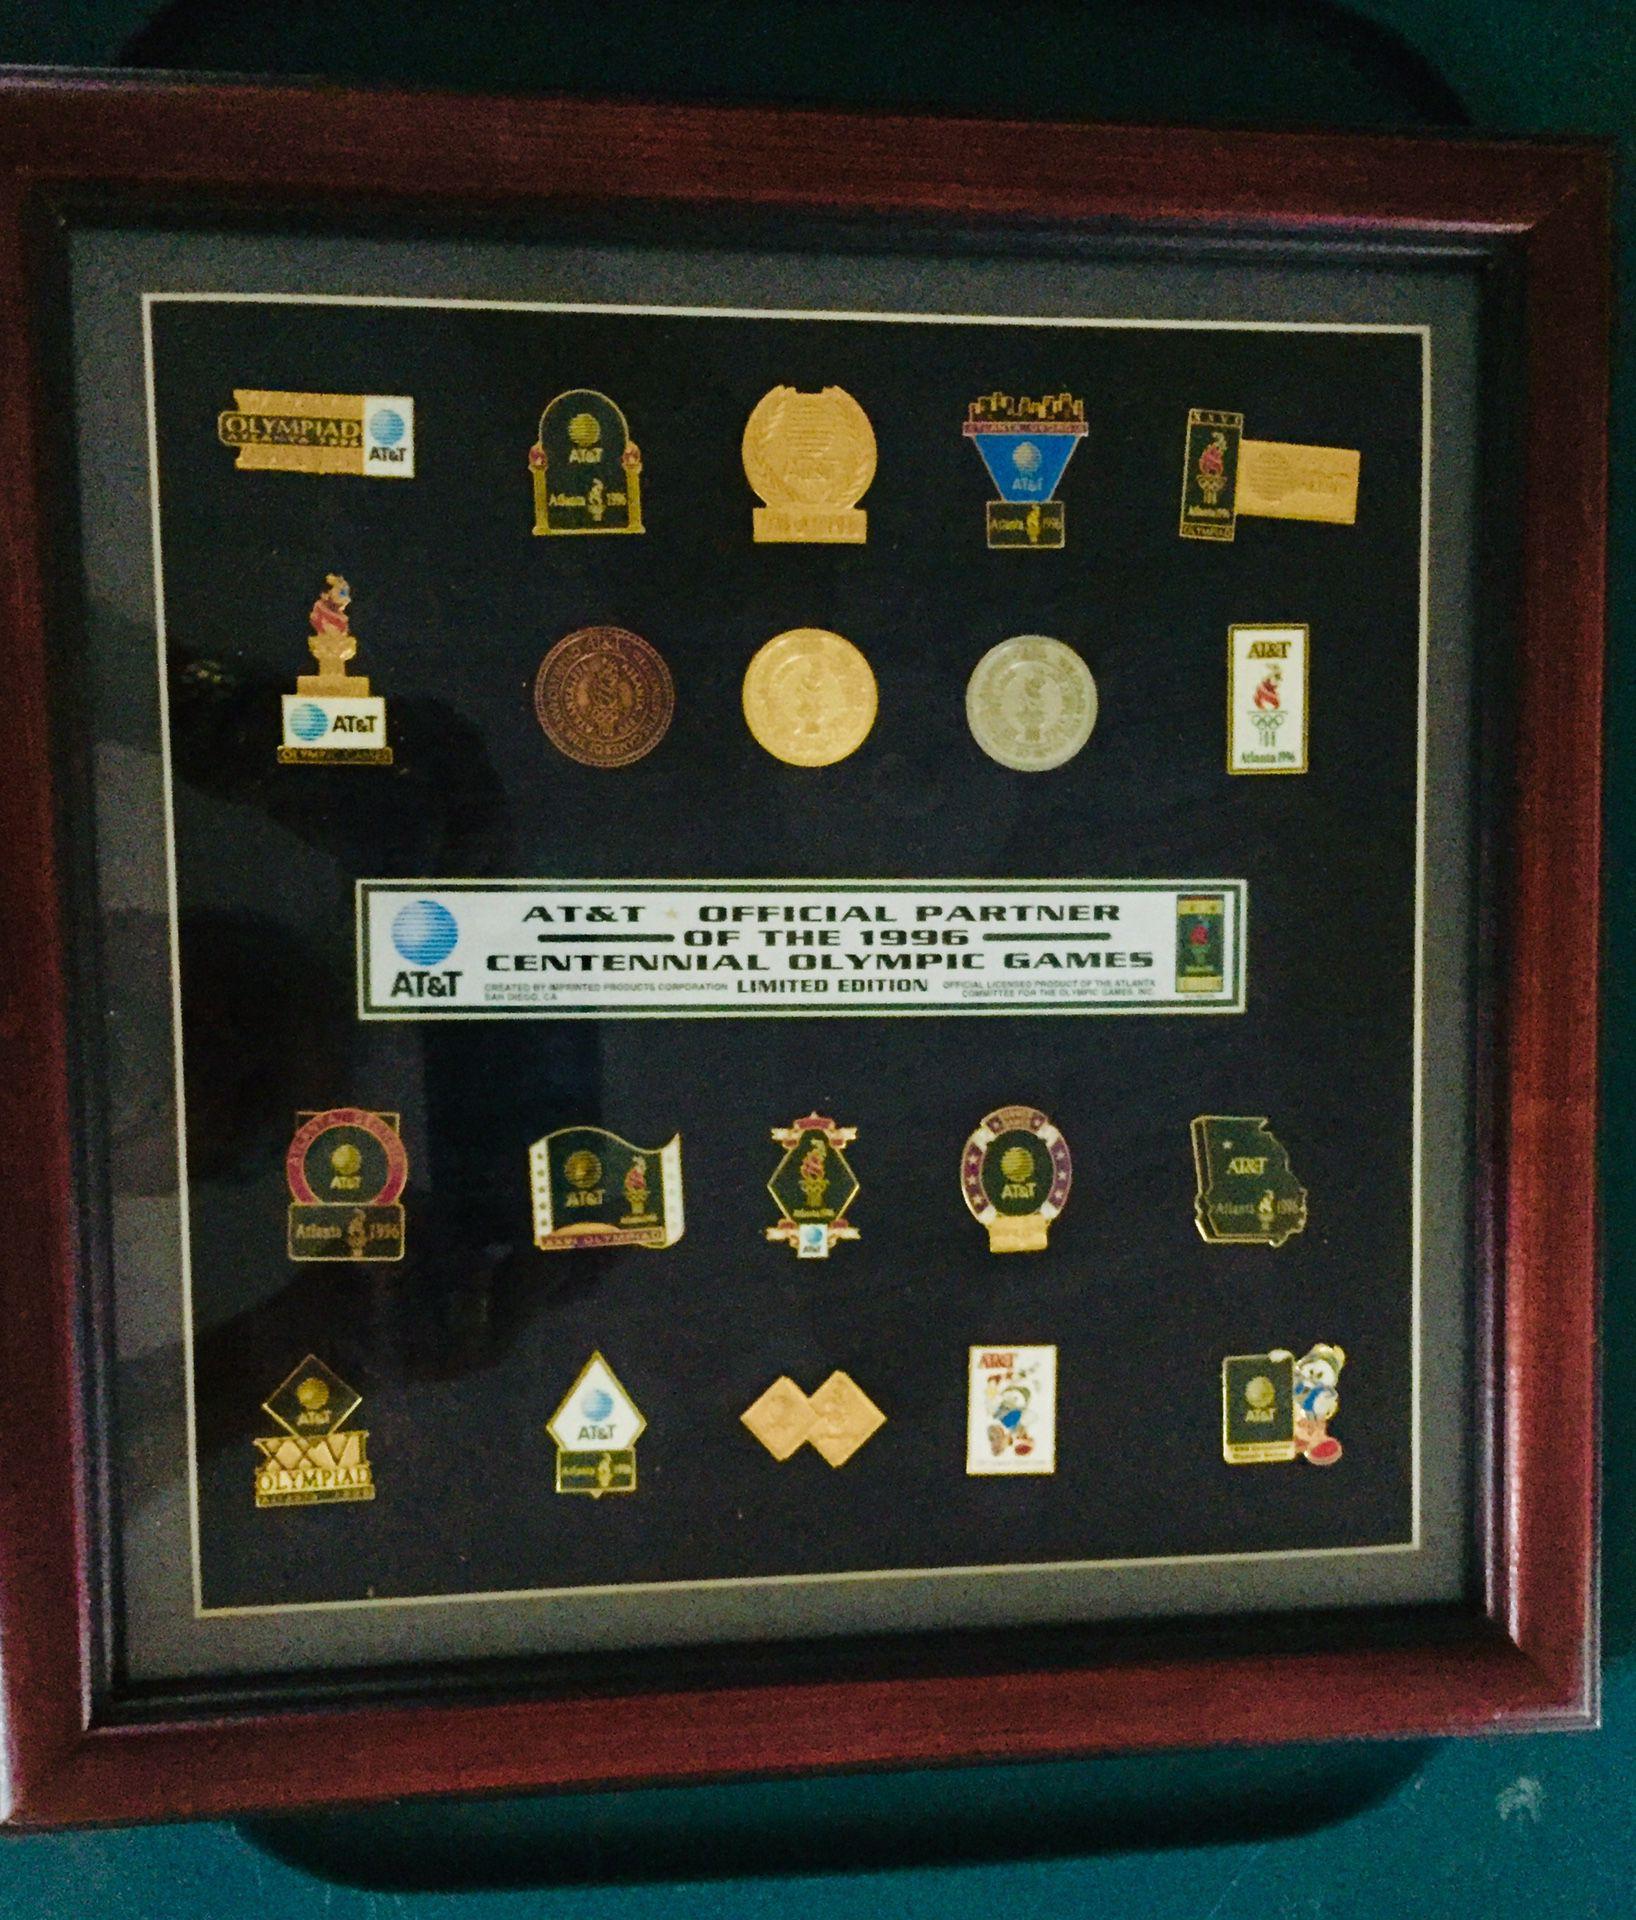 1996 AT&T Centennial Framed Olympic Pins